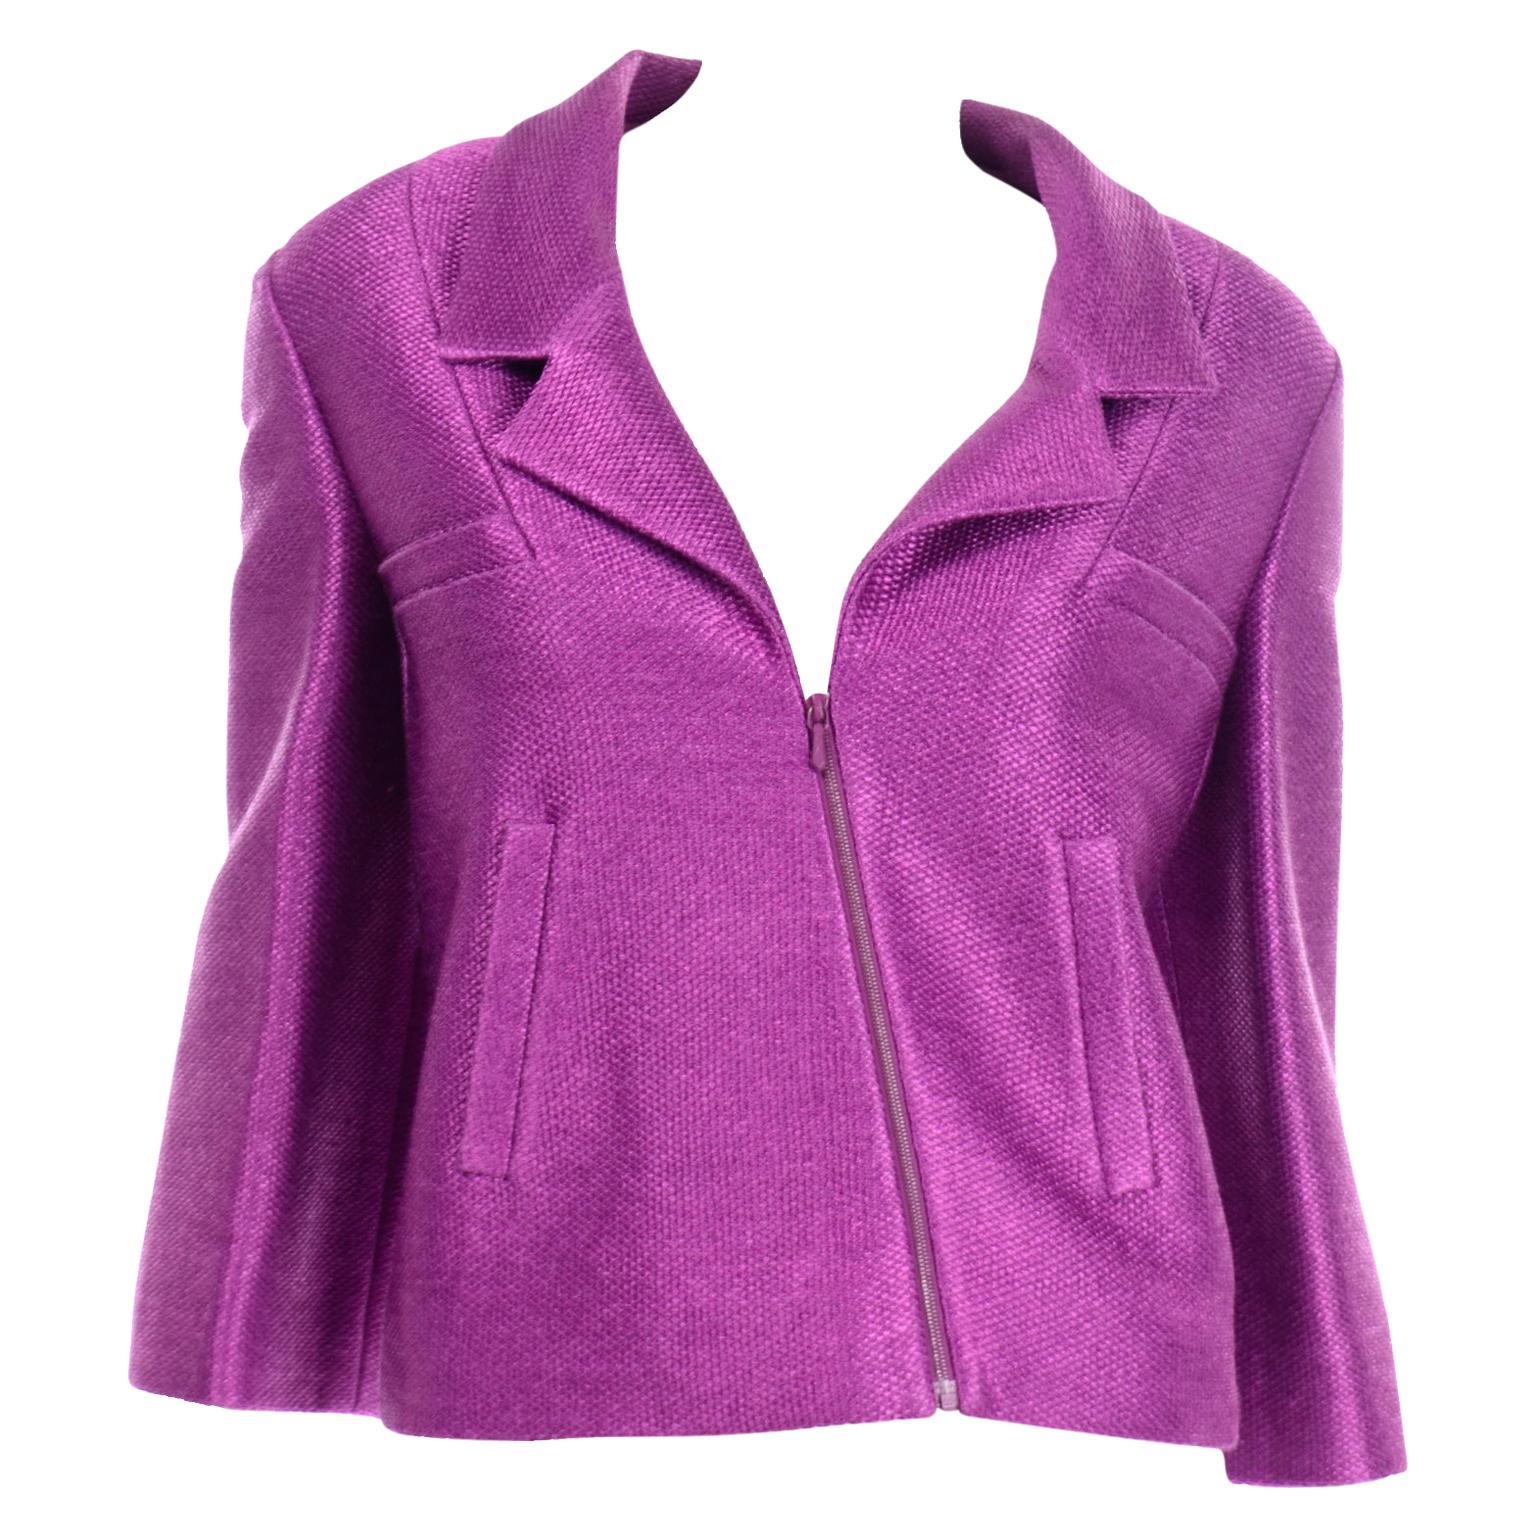 Chanel 2001 Magenta Purple Metallic Cropped Jacket w Asymmetrical Zipper